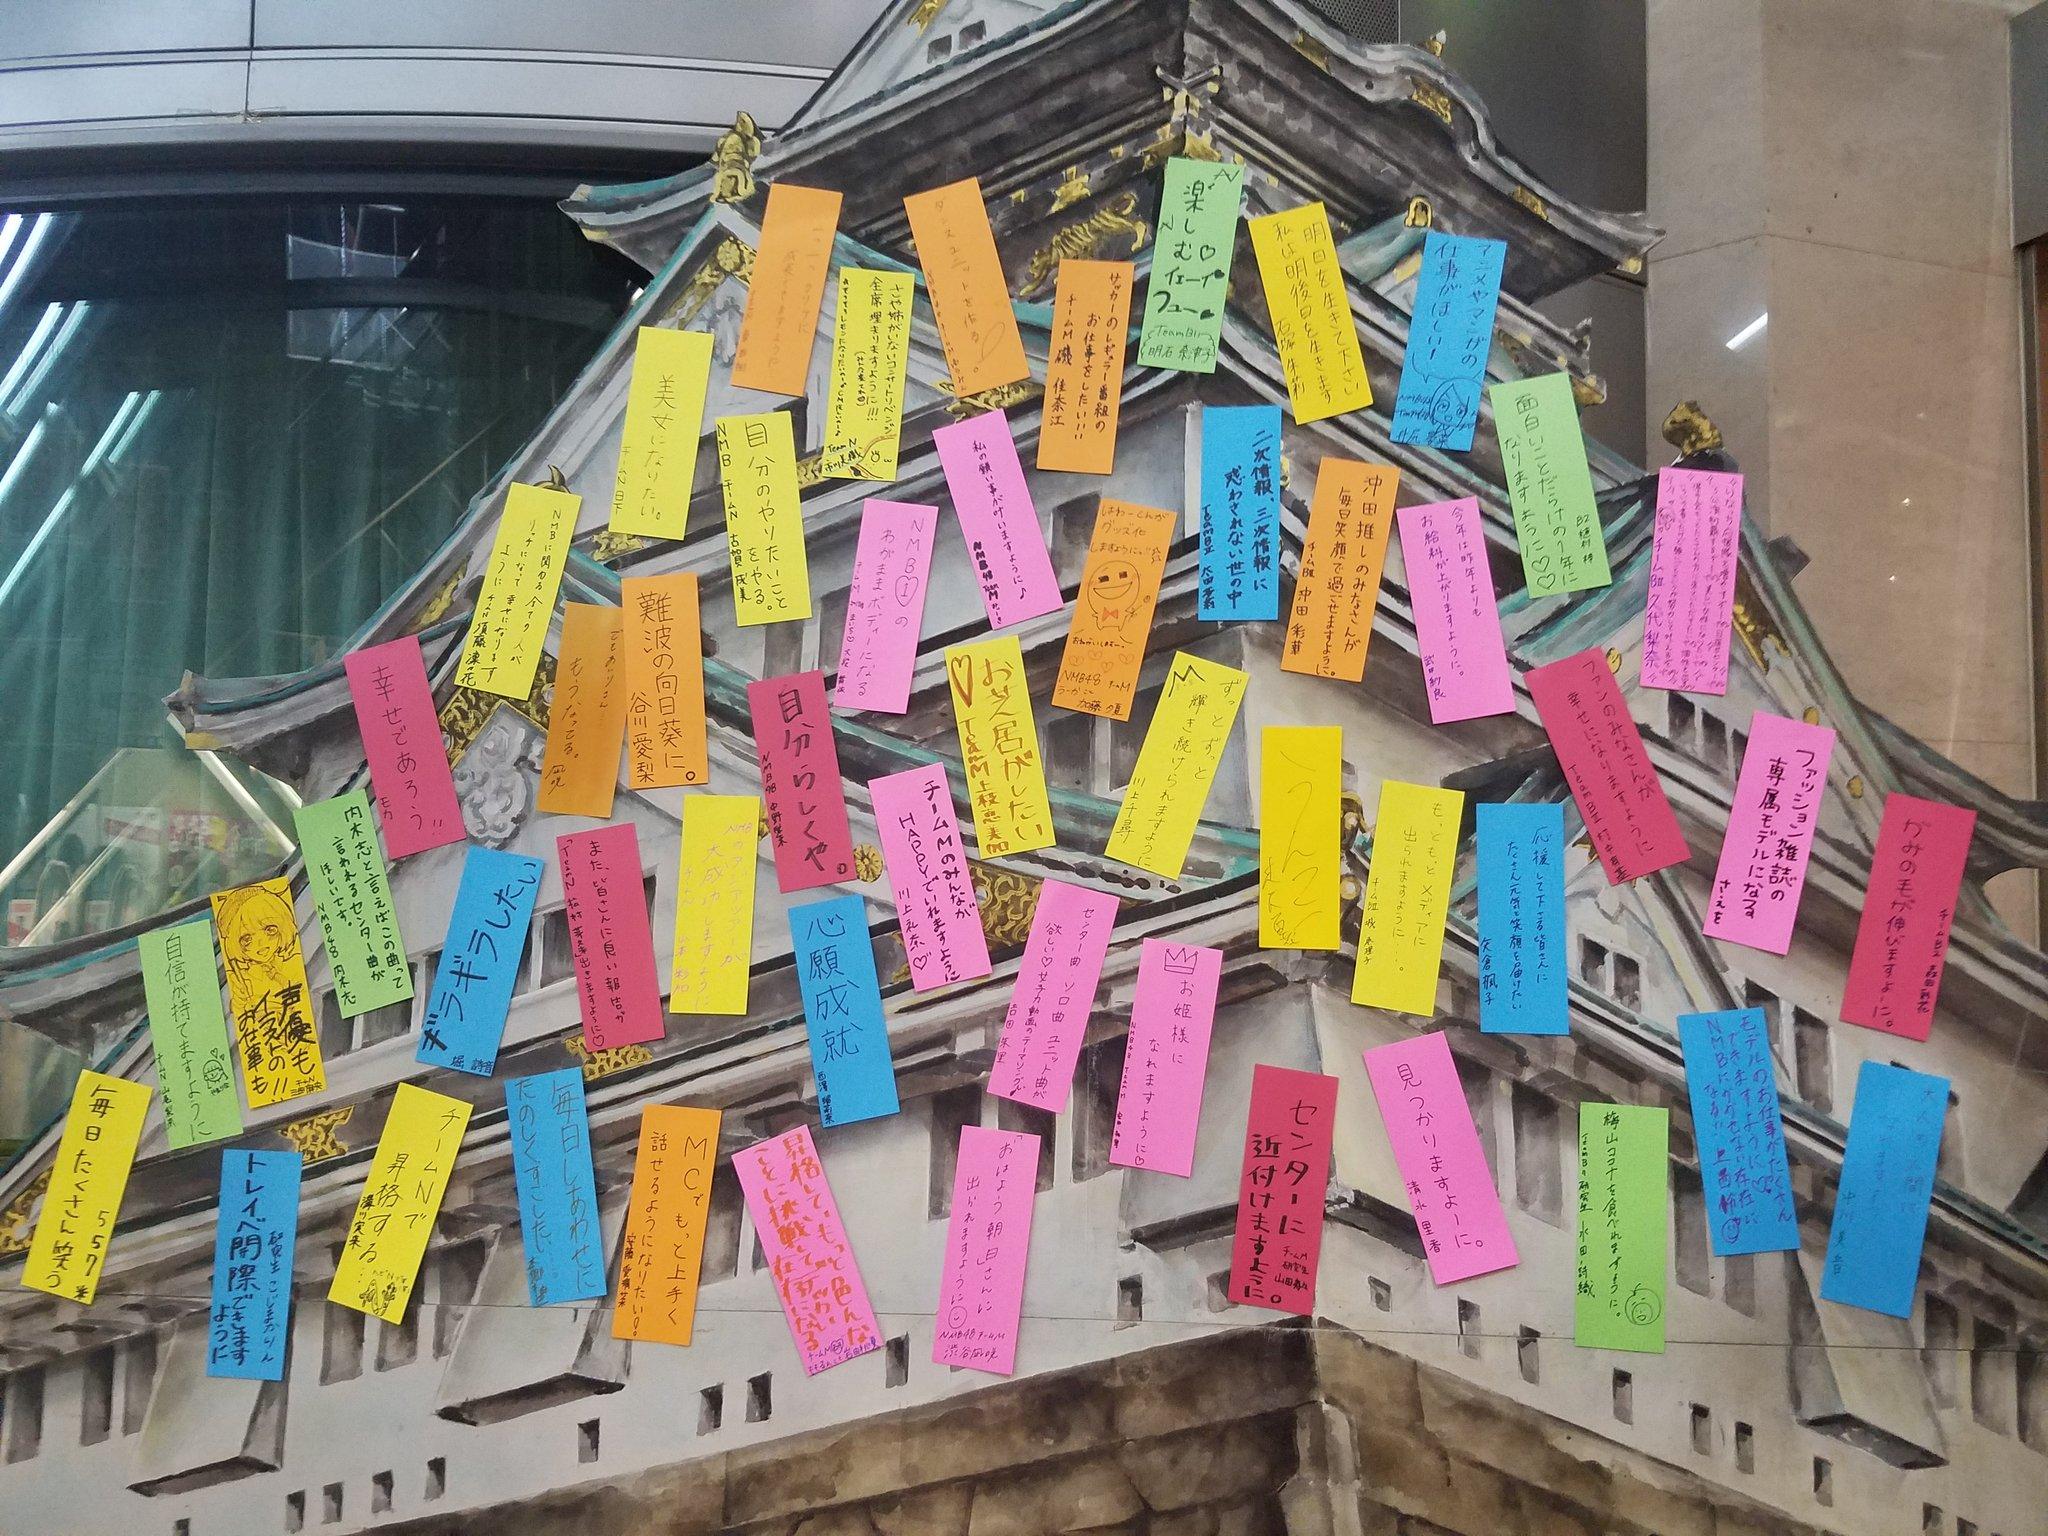 【NMB48】太田夢莉応援スレ★74【ゆーり】©2ch.netYouTube動画>74本 ->画像>1393枚